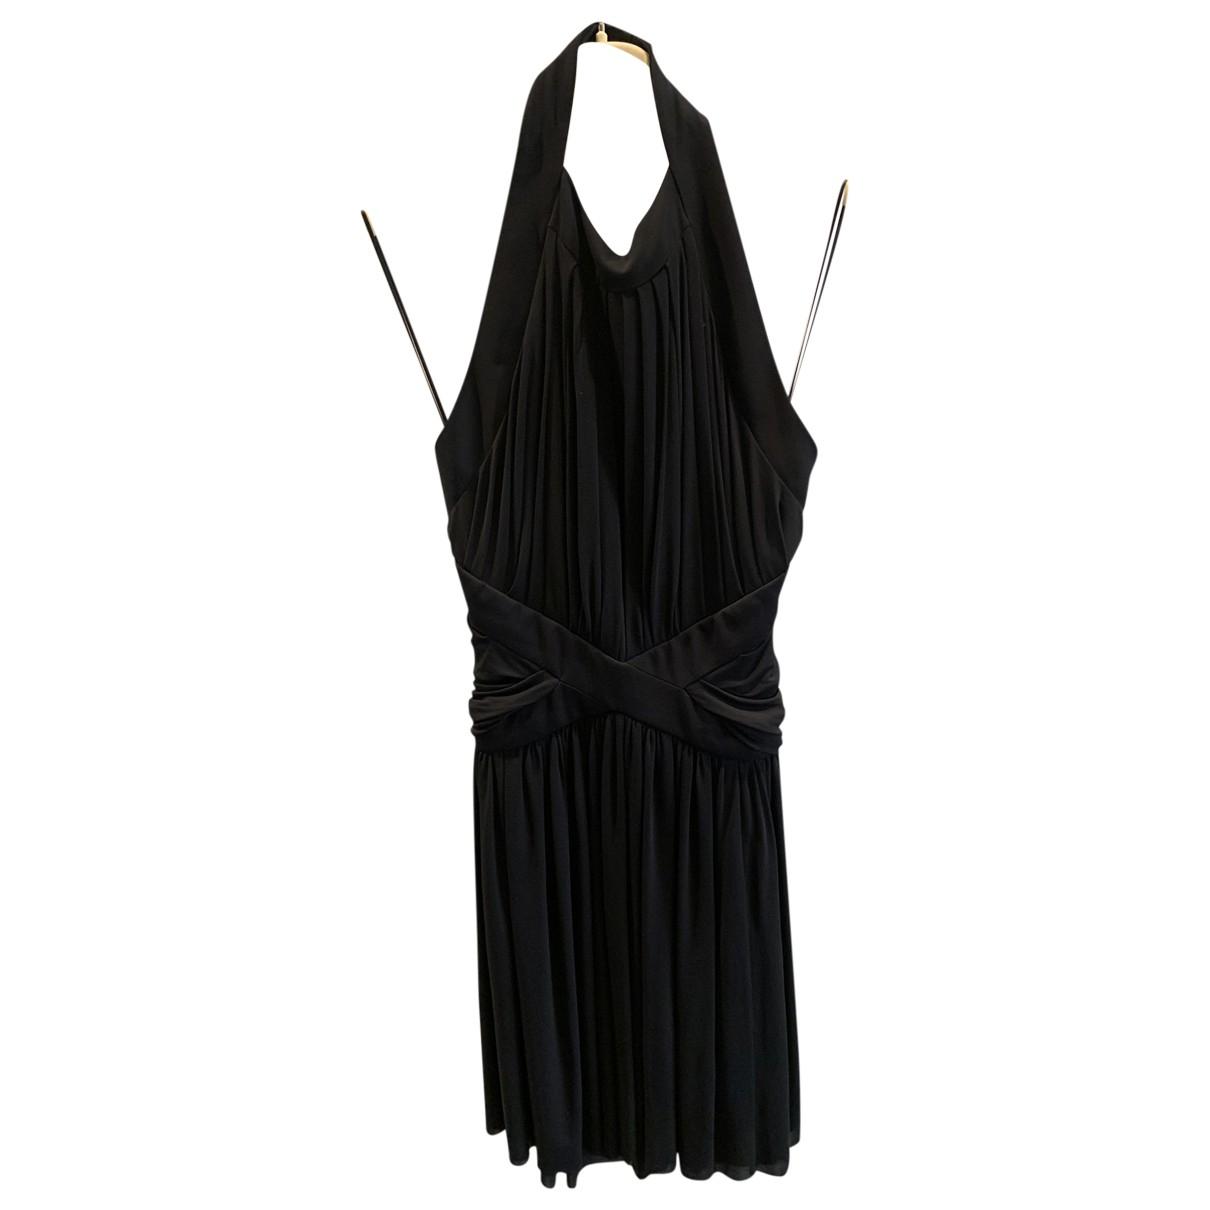 Balmain \N Black dress for Women 40 IT